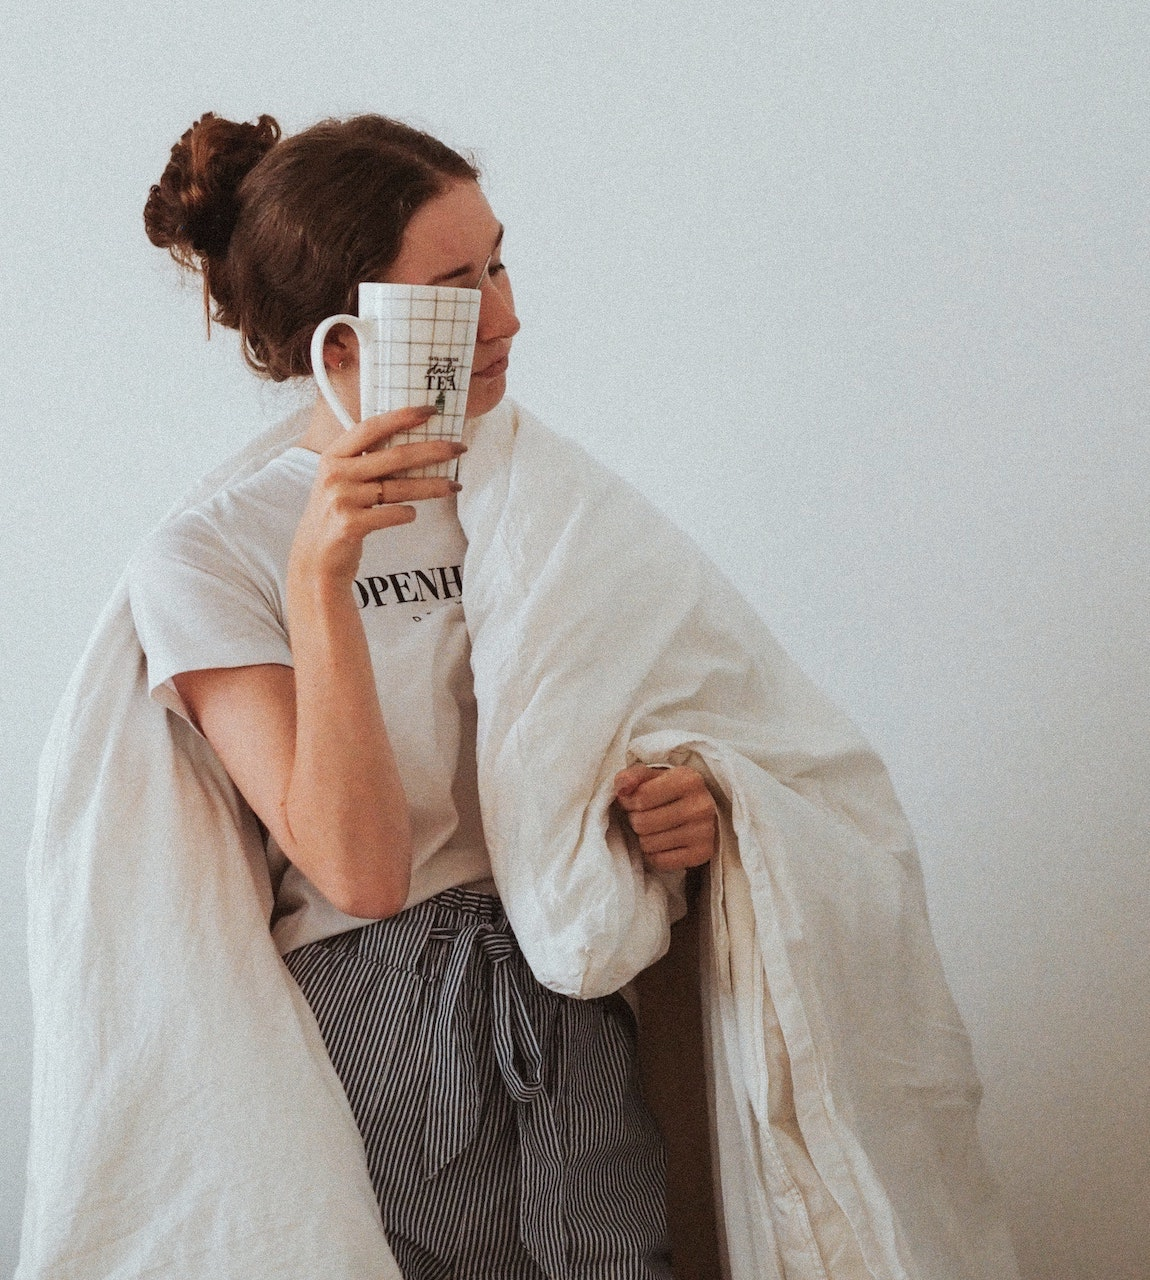 Tips για να καταπολεμήσεις την υπερένταση και να κοιμηθείς σαν πουλάκι